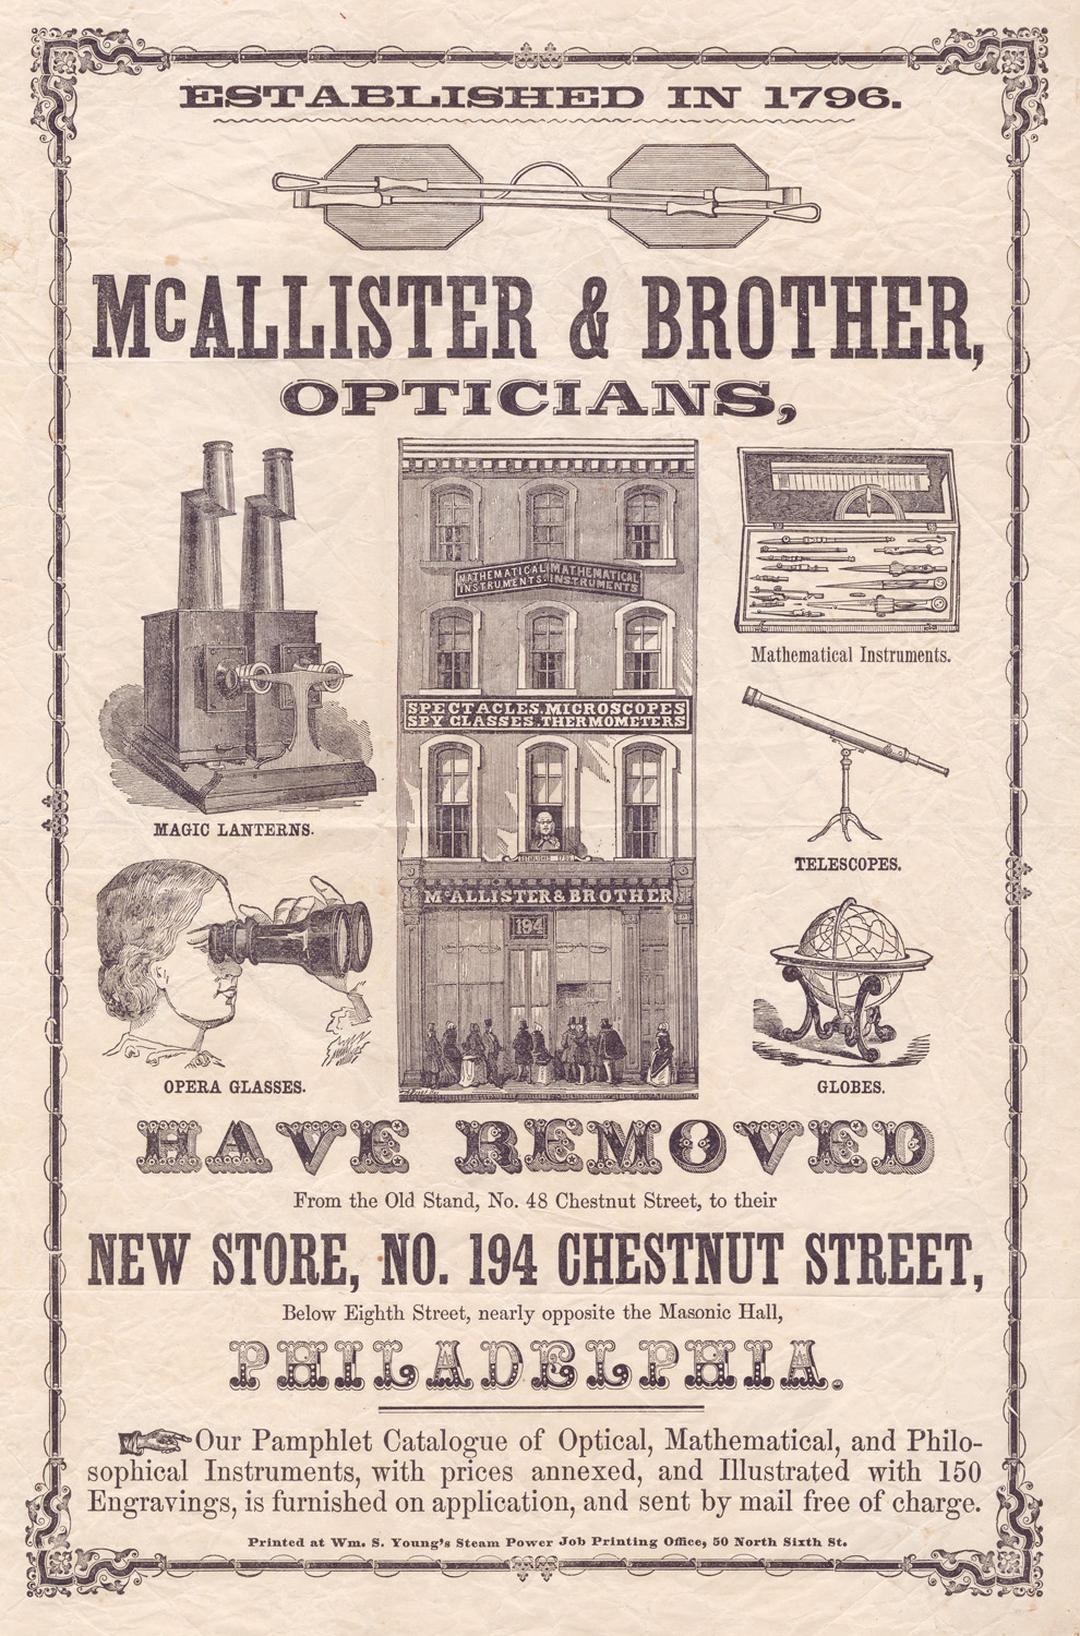 1855 broadside